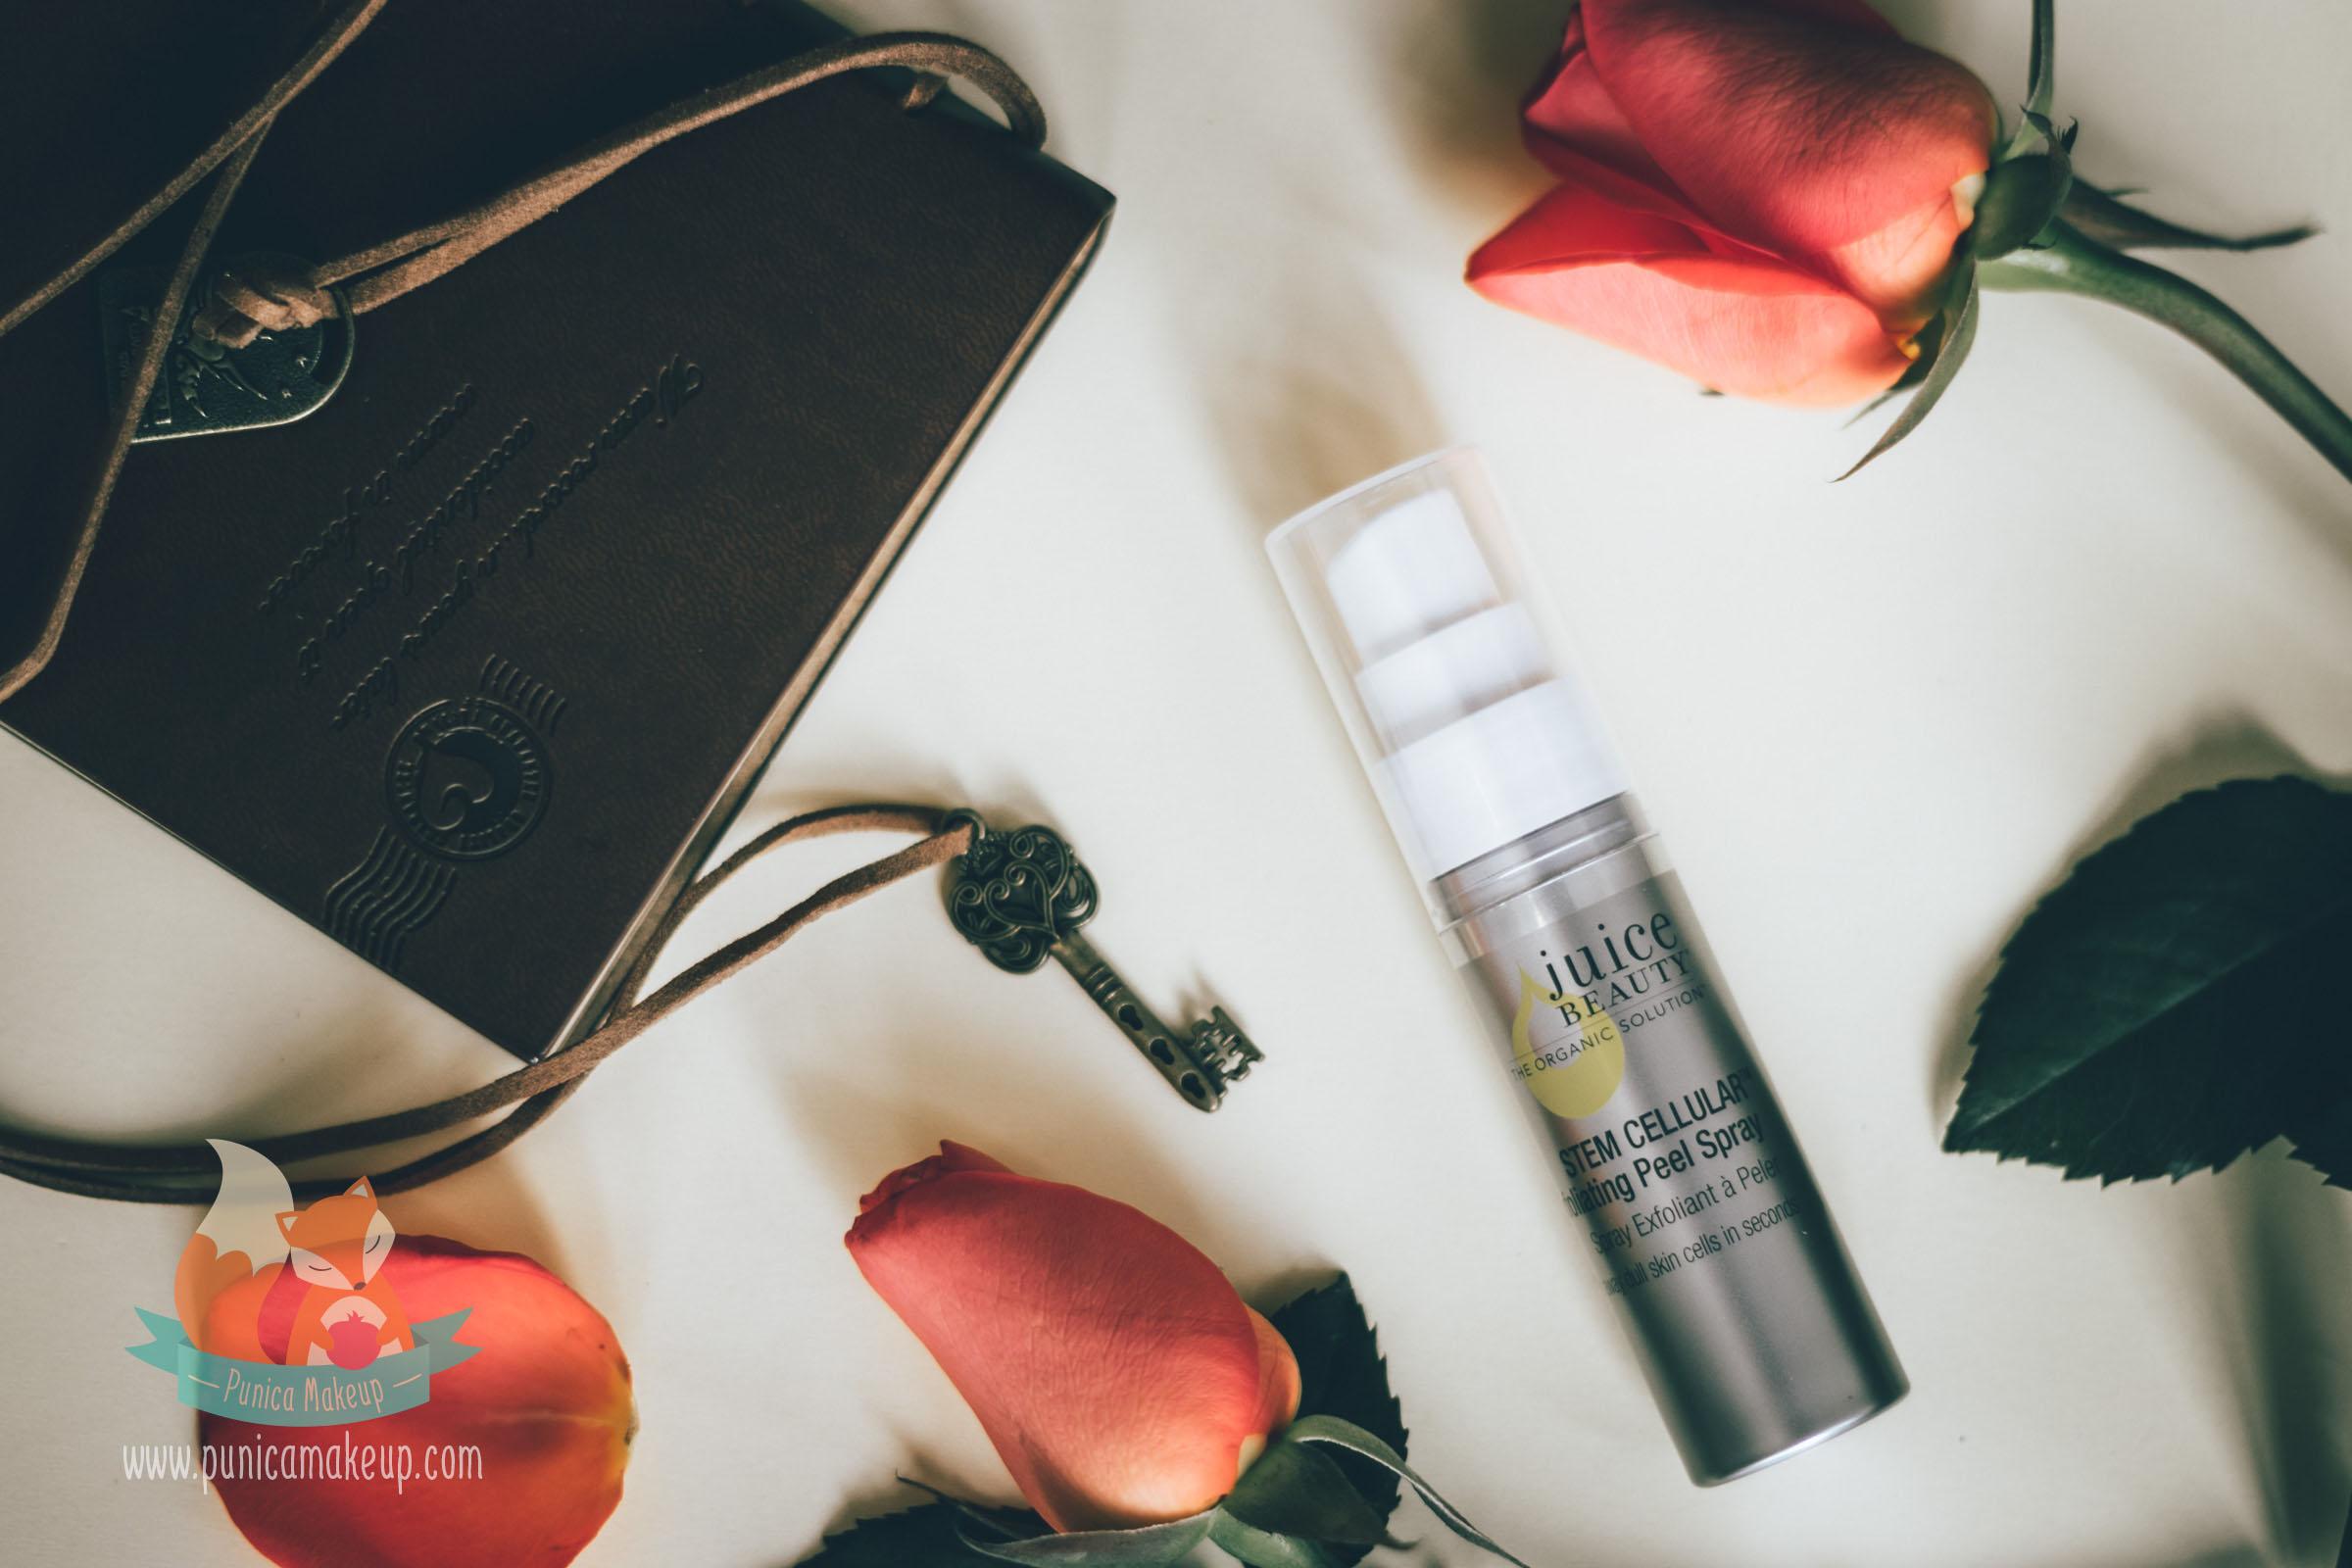 Stem Cellular Exfoliating Peel Spray by Juice Beauty #6